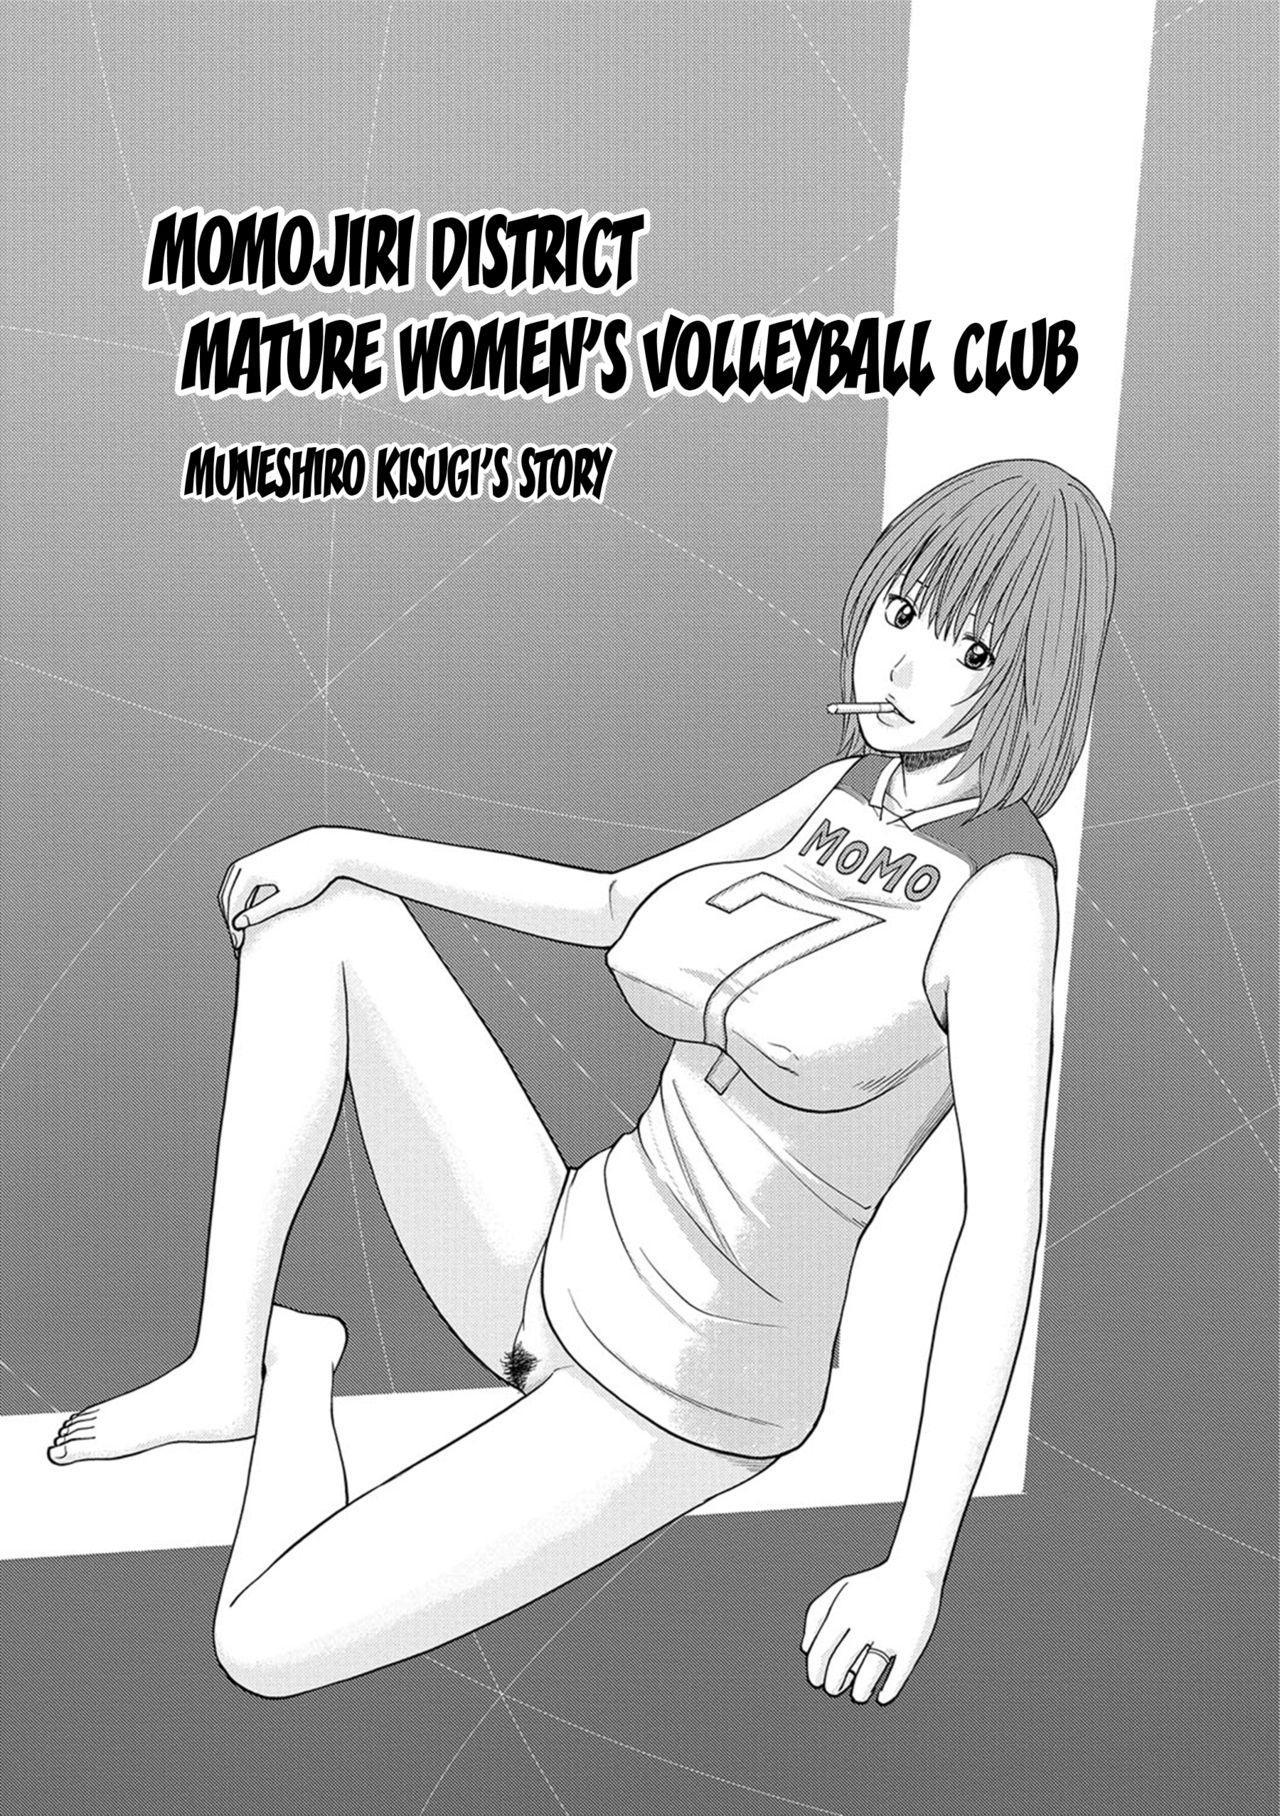 [Kuroki Hidehiko] Momojiri Danchi Mama-san Volley Doukoukai - Mom's Volley Ball | Momojiri District Mature Women's Volleyball Club Ch.1-9 [English] {Doujins.com} [Digital] 44